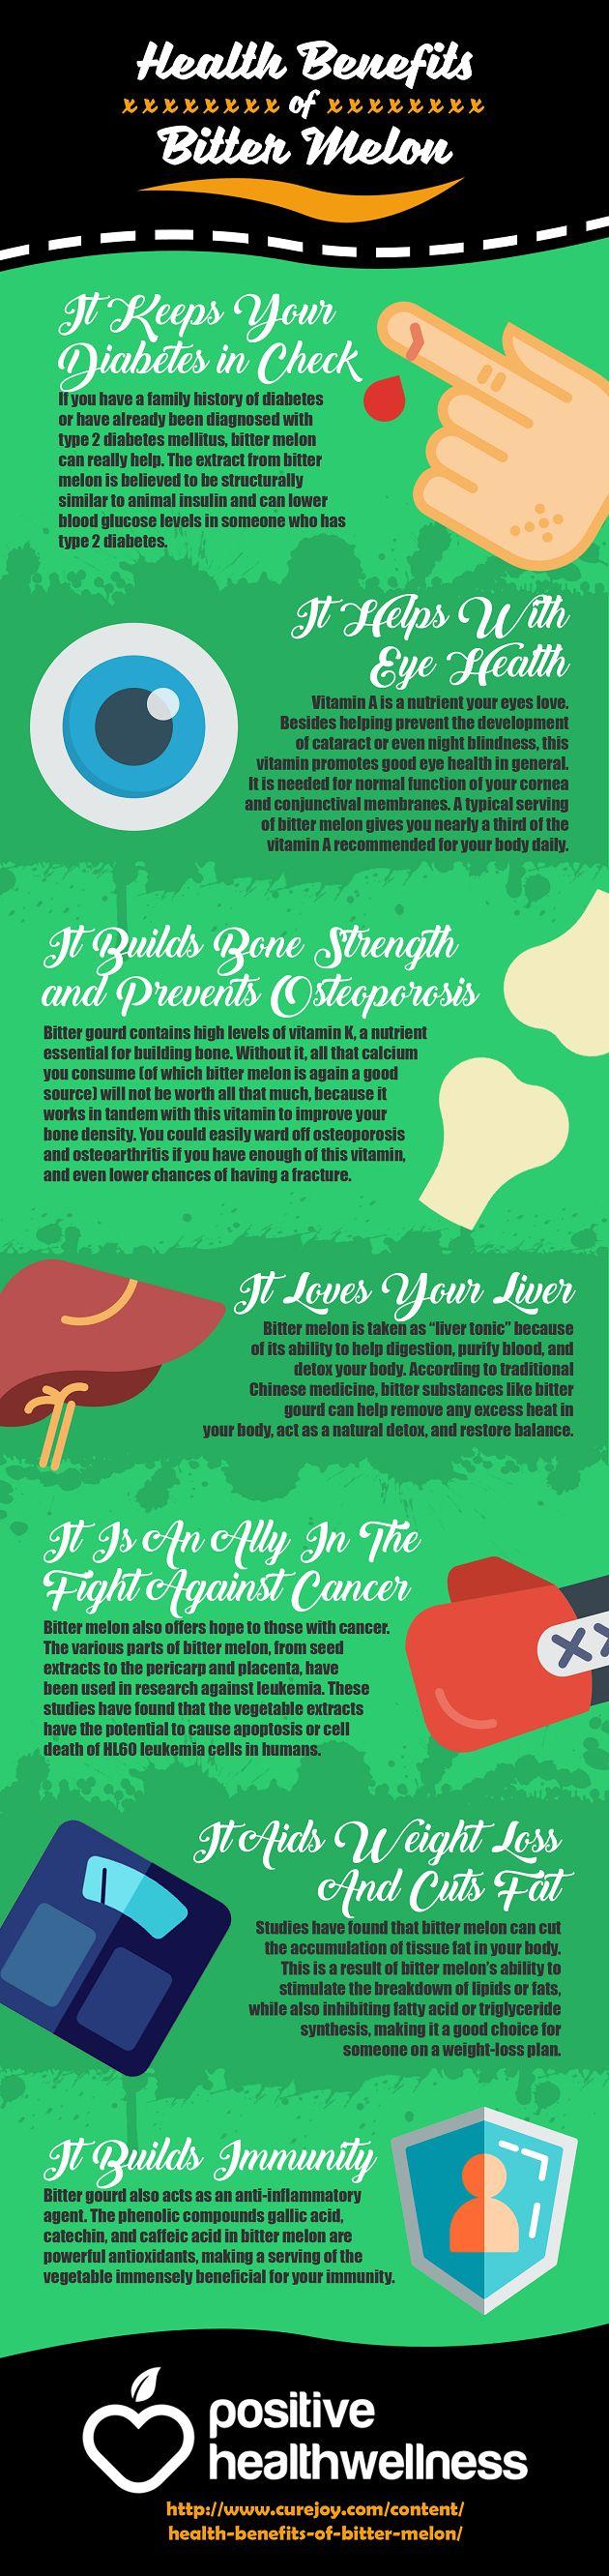 Health Benefits of Bitter Melon – Positive Health Wellness Infographic